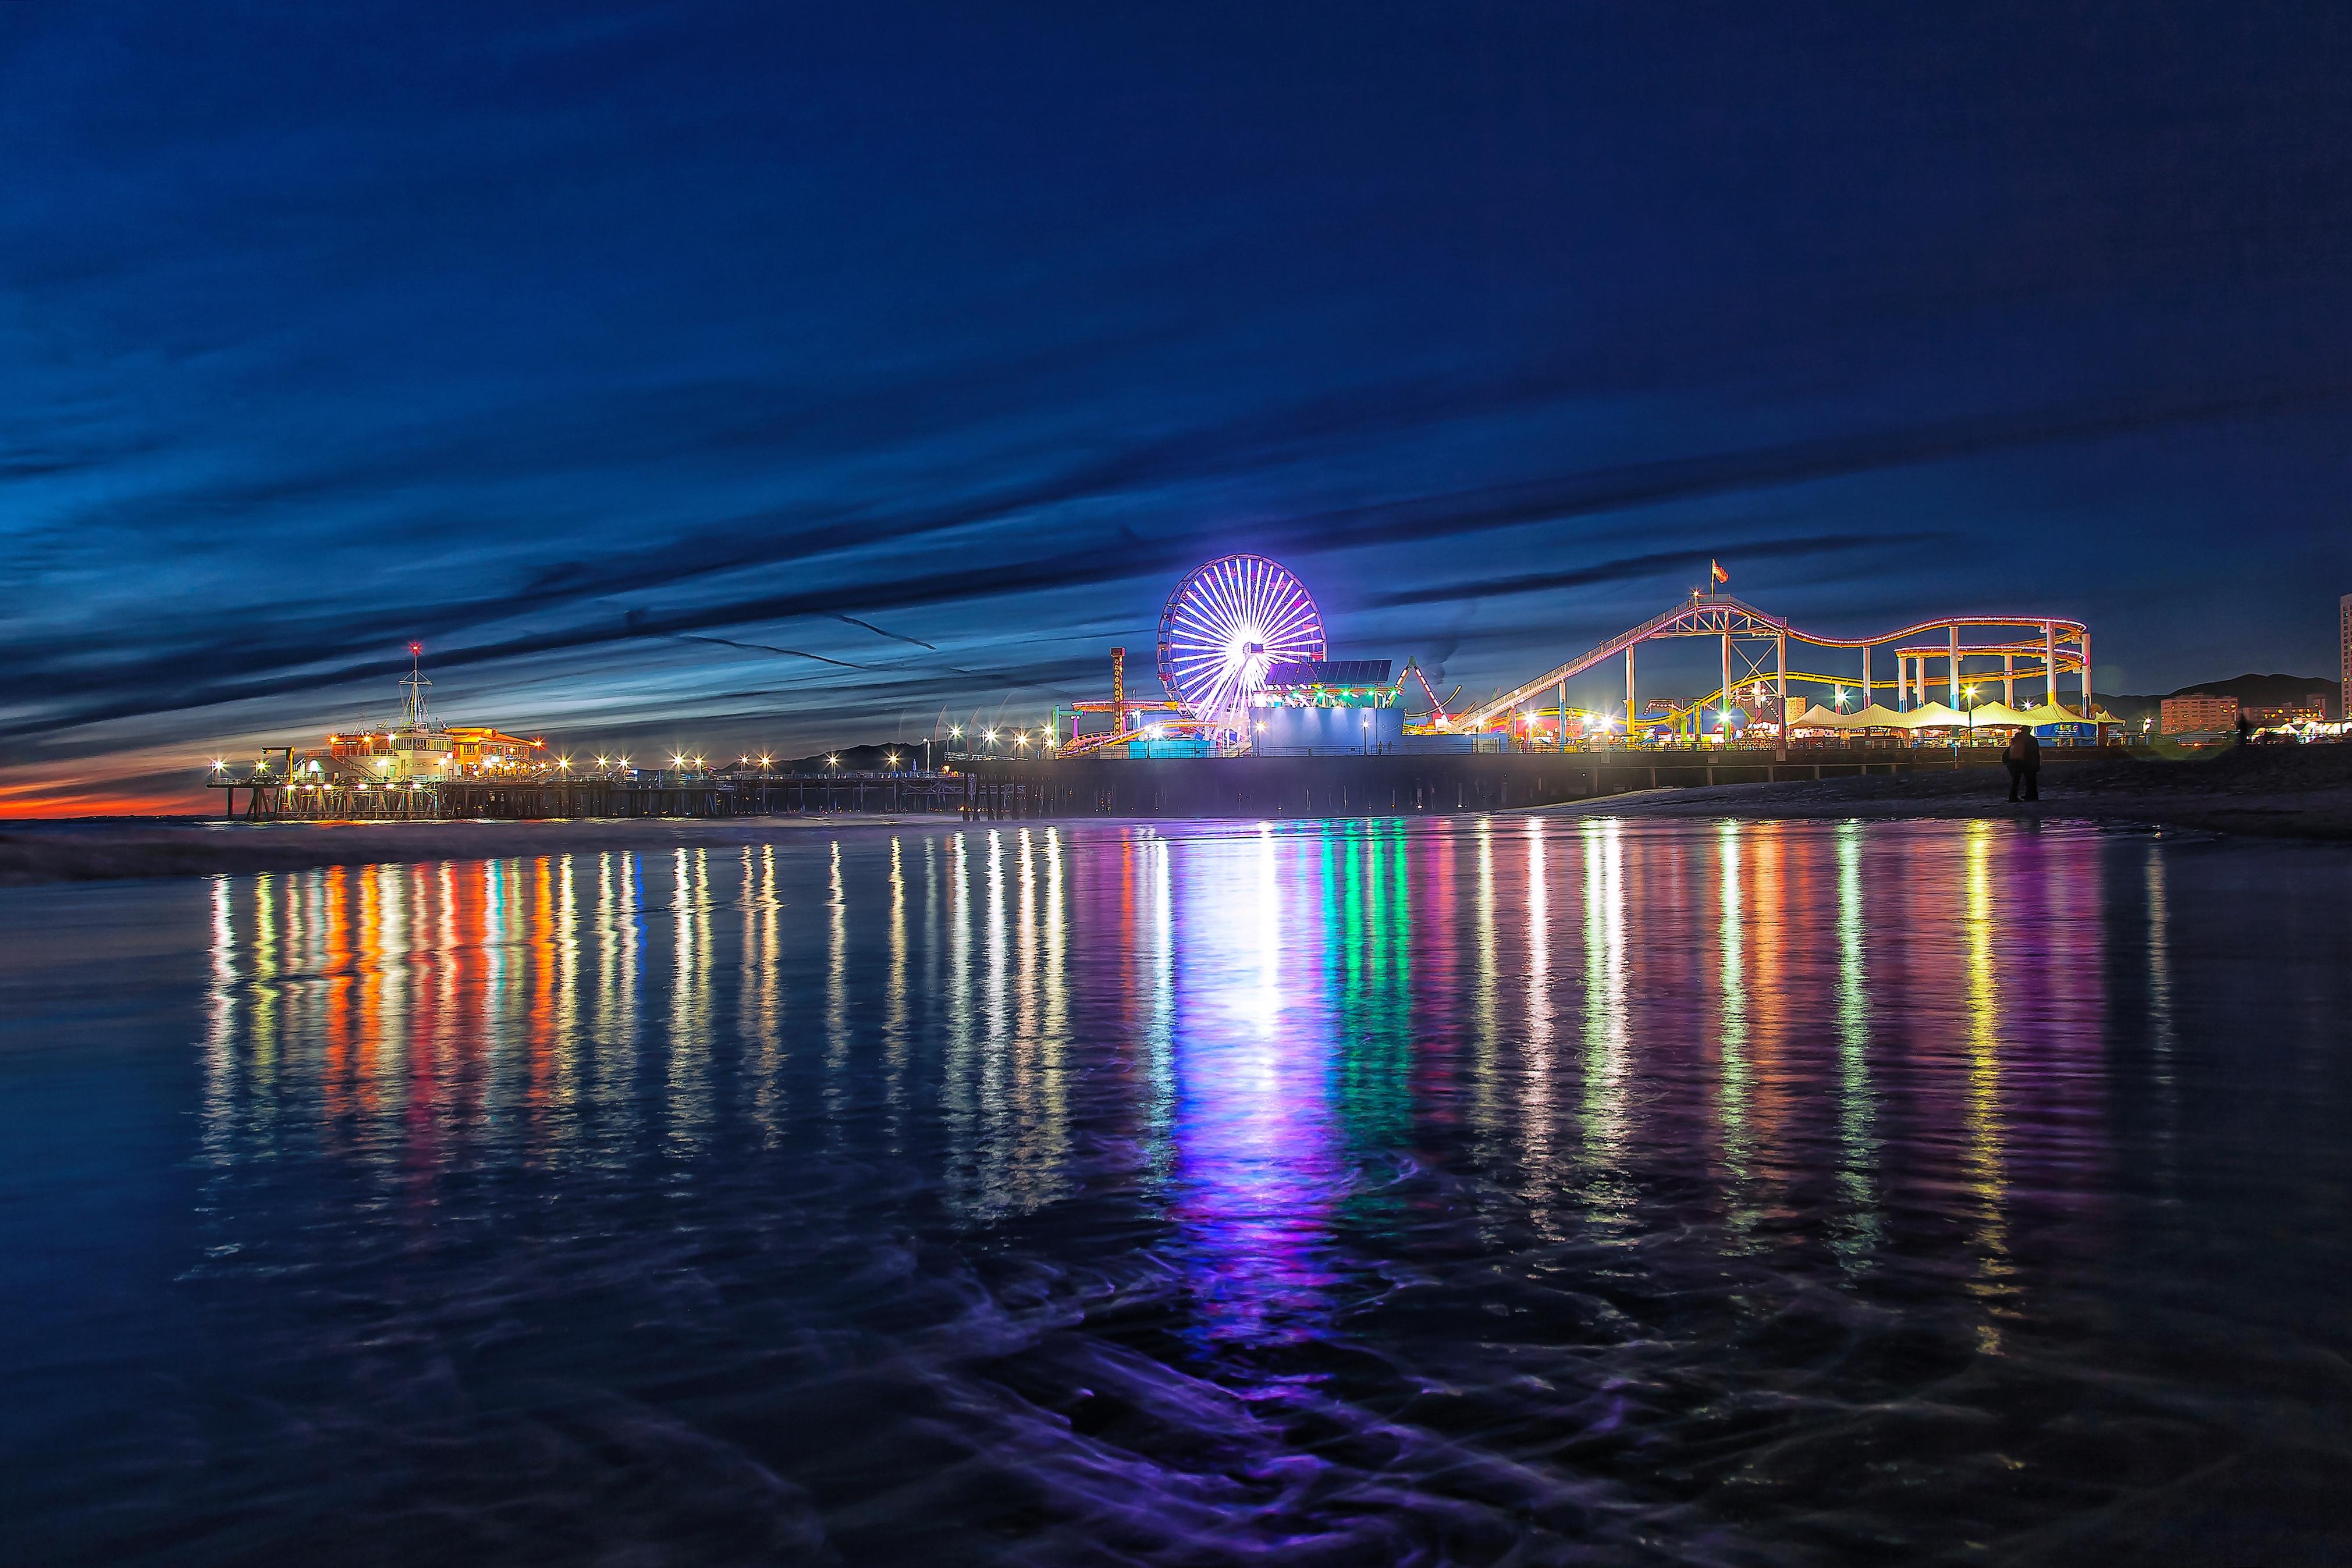 SM Pier 2